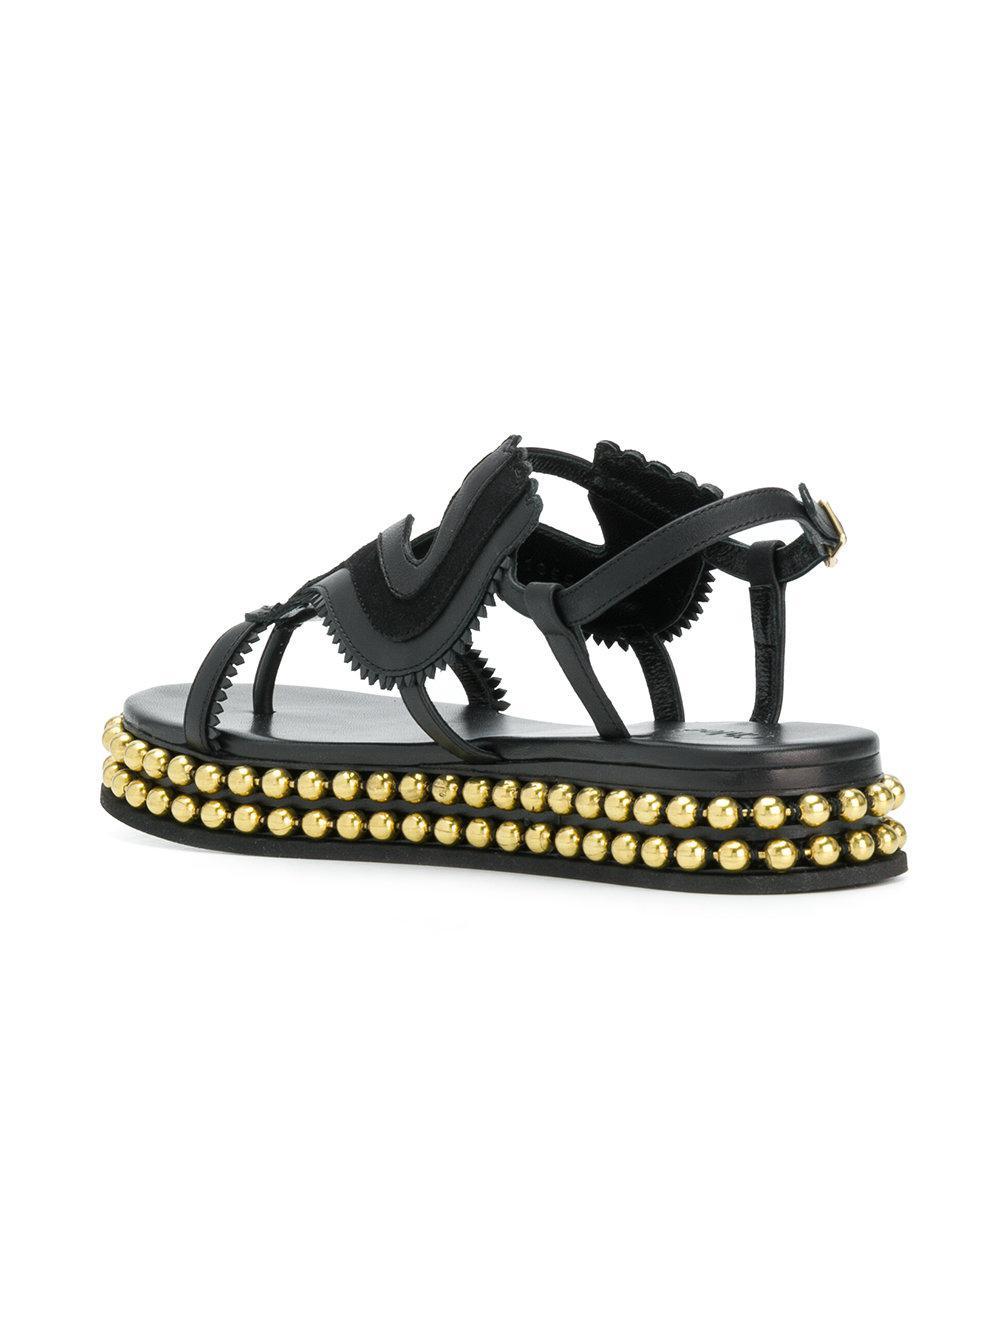 sale retailer b06c7 9dcdd chloe-Black-Almond-Toe-Studded-Sole-Sandals.jpeg